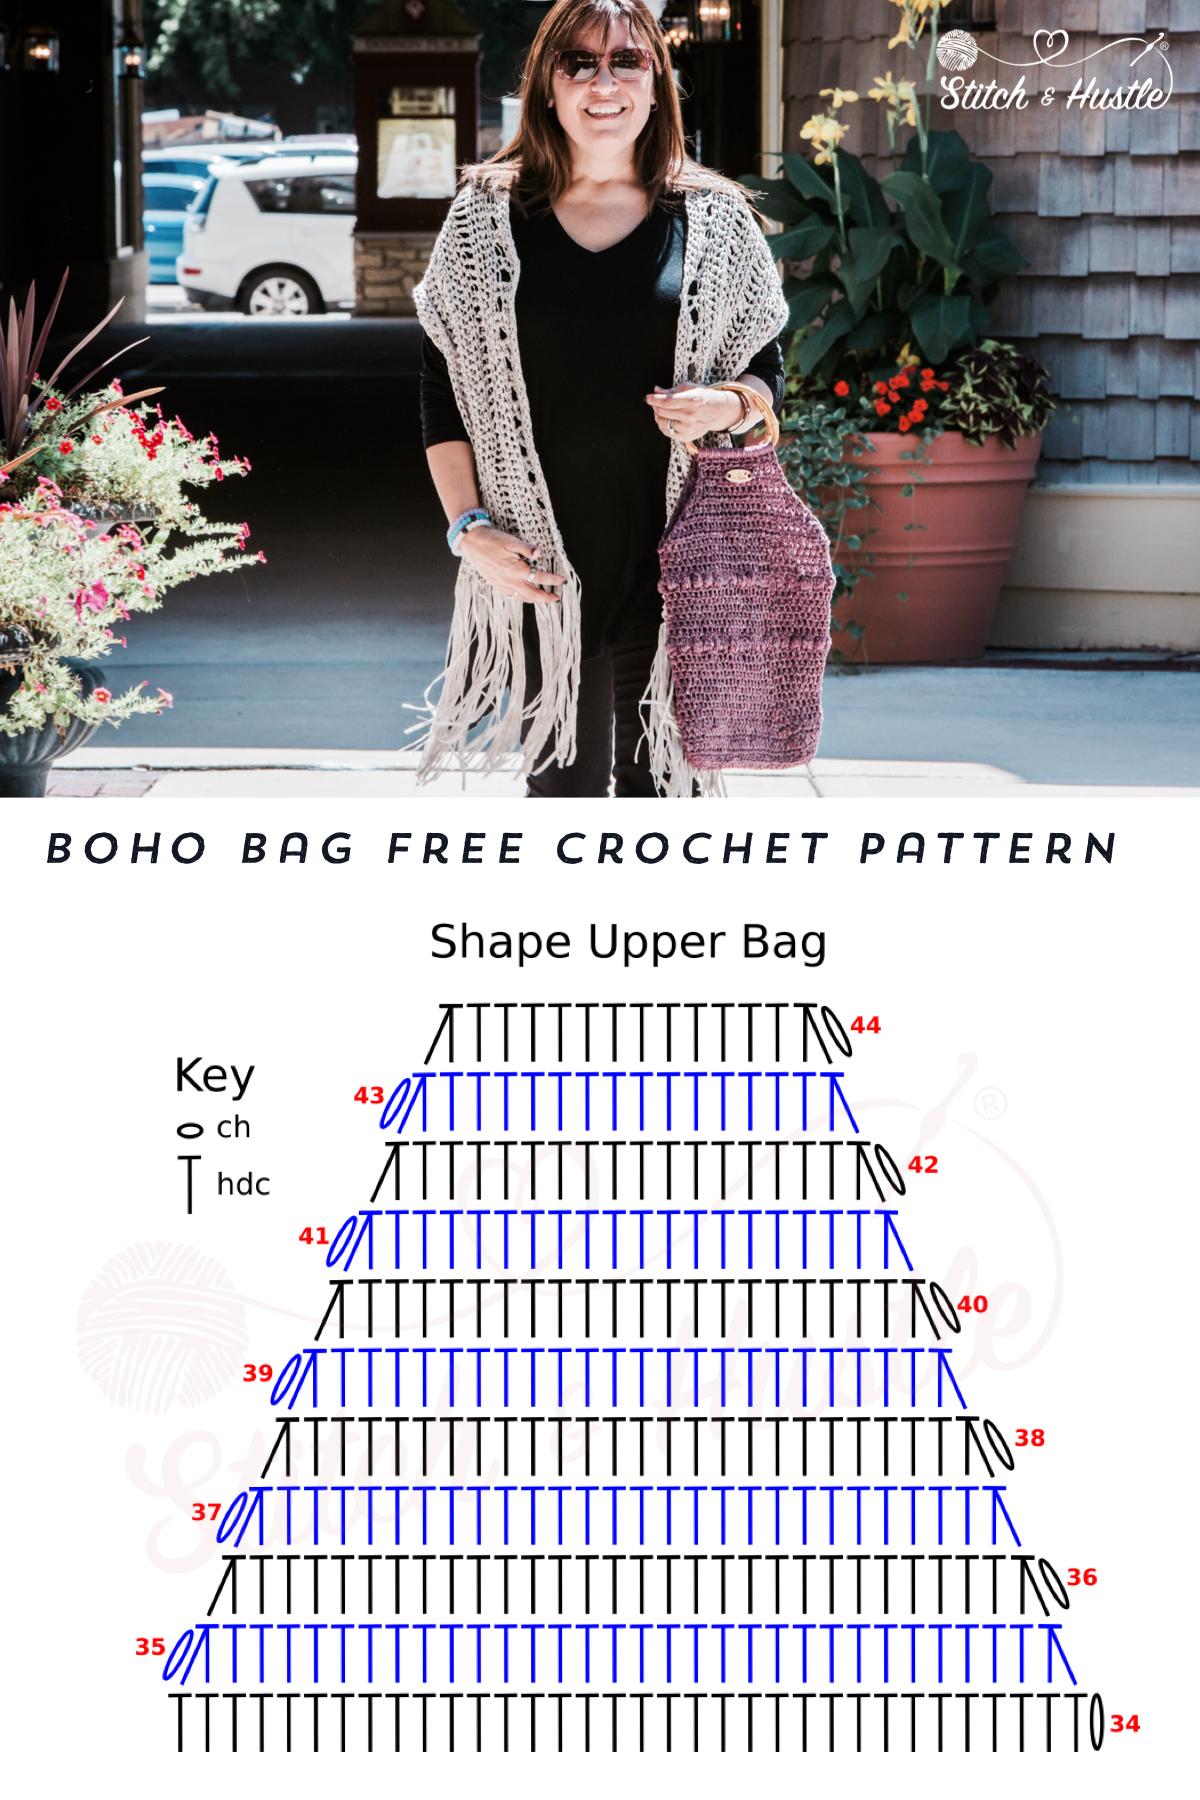 Downtown_Crochet_Bag_Free_pattern_1.jpg